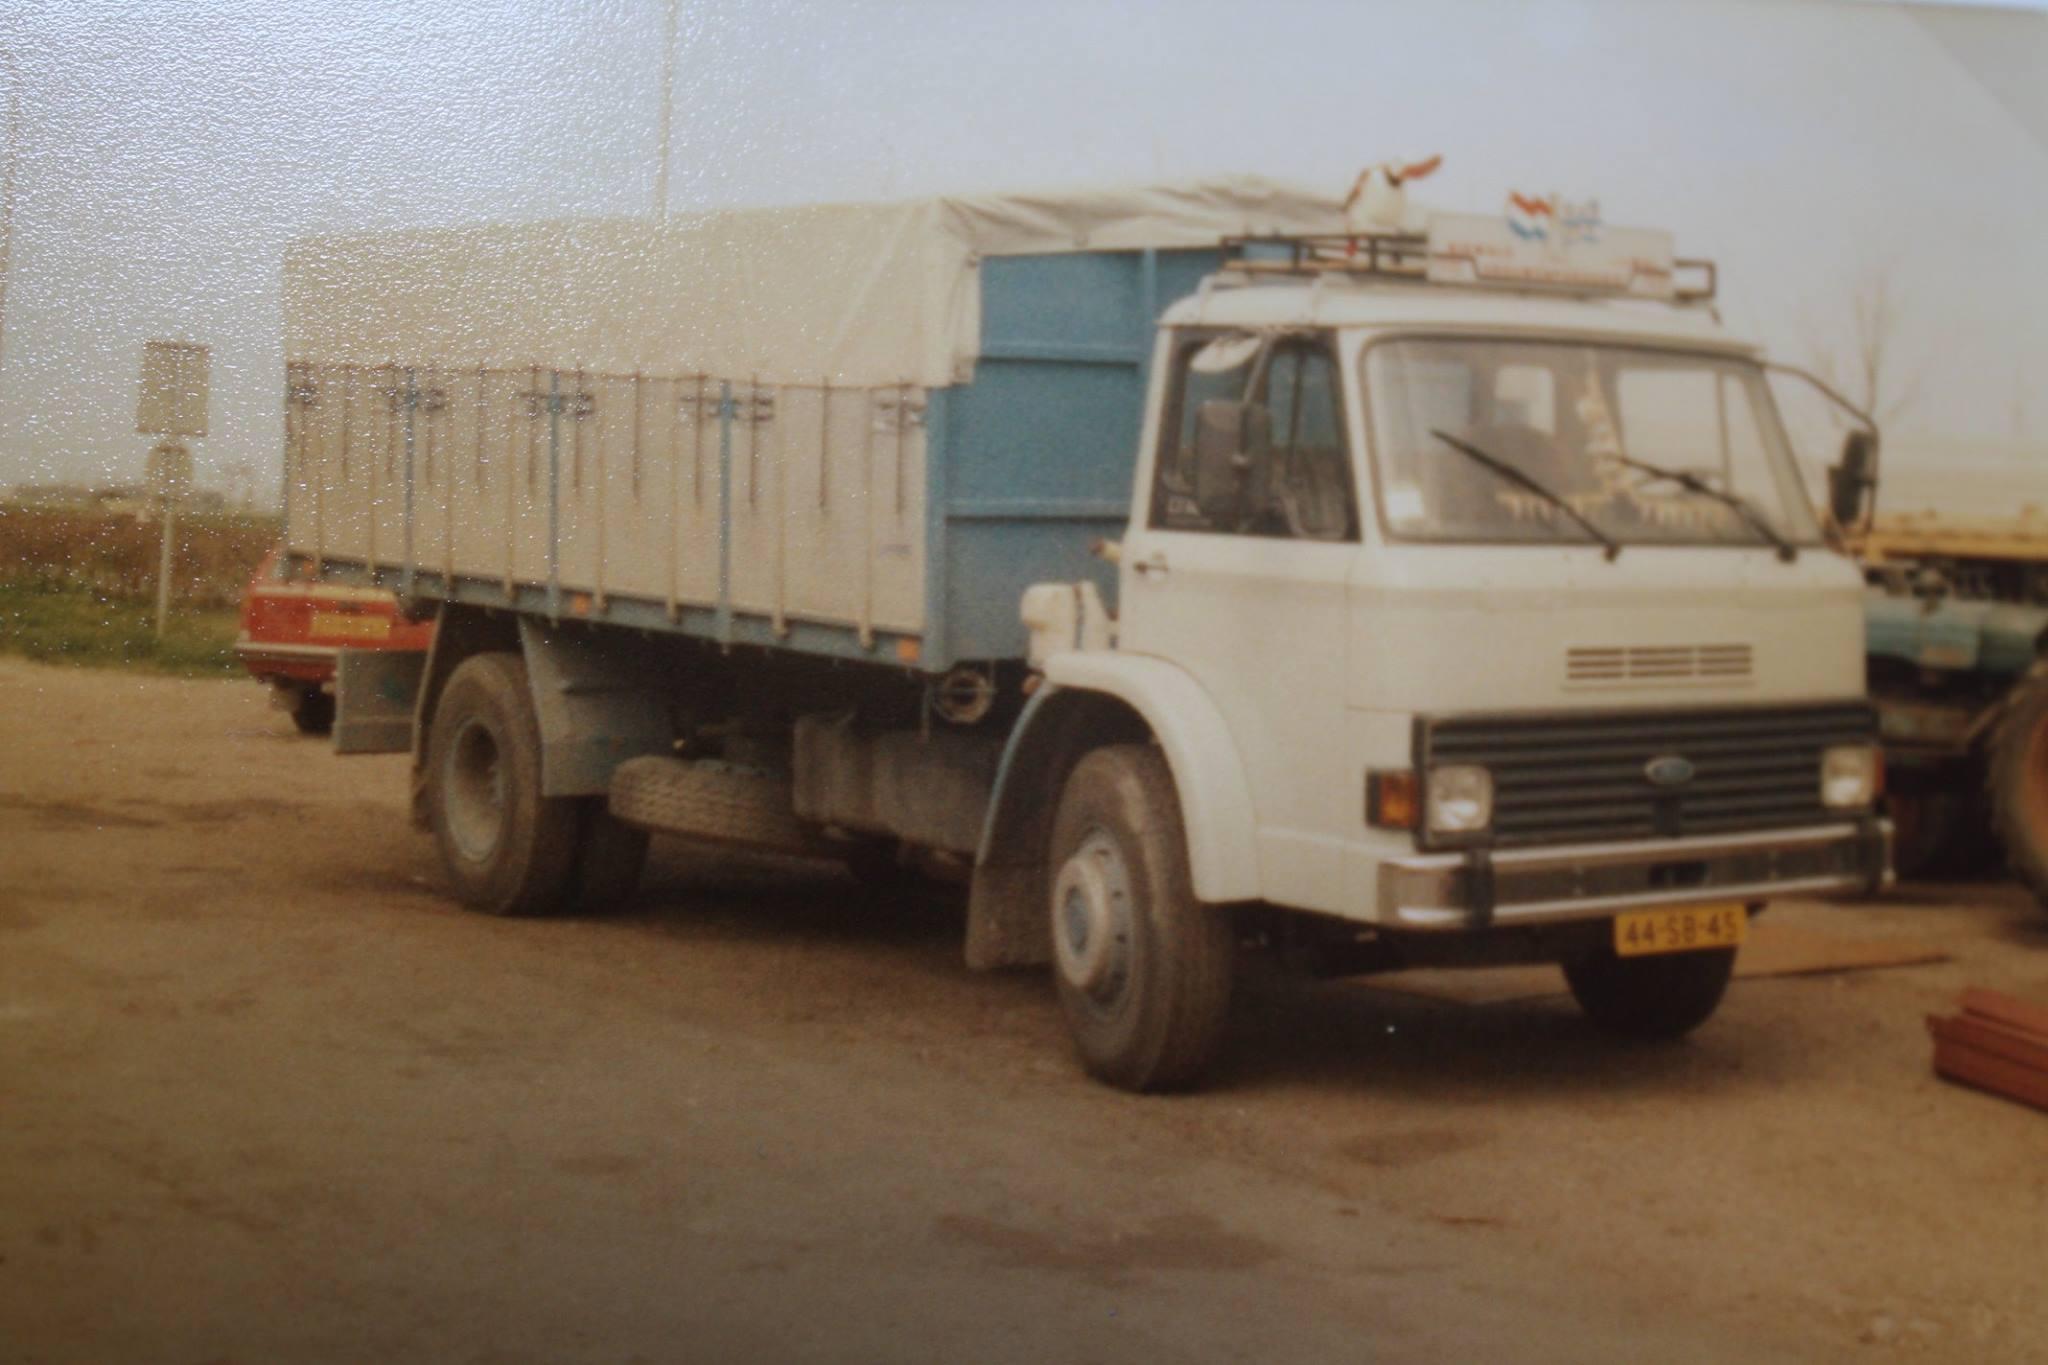 Ford-bulkauto-is-ook-door-Rondaan-in-Beetgum-opgebouwd-Riewald---v-d-Wal--Vrouwenparochie